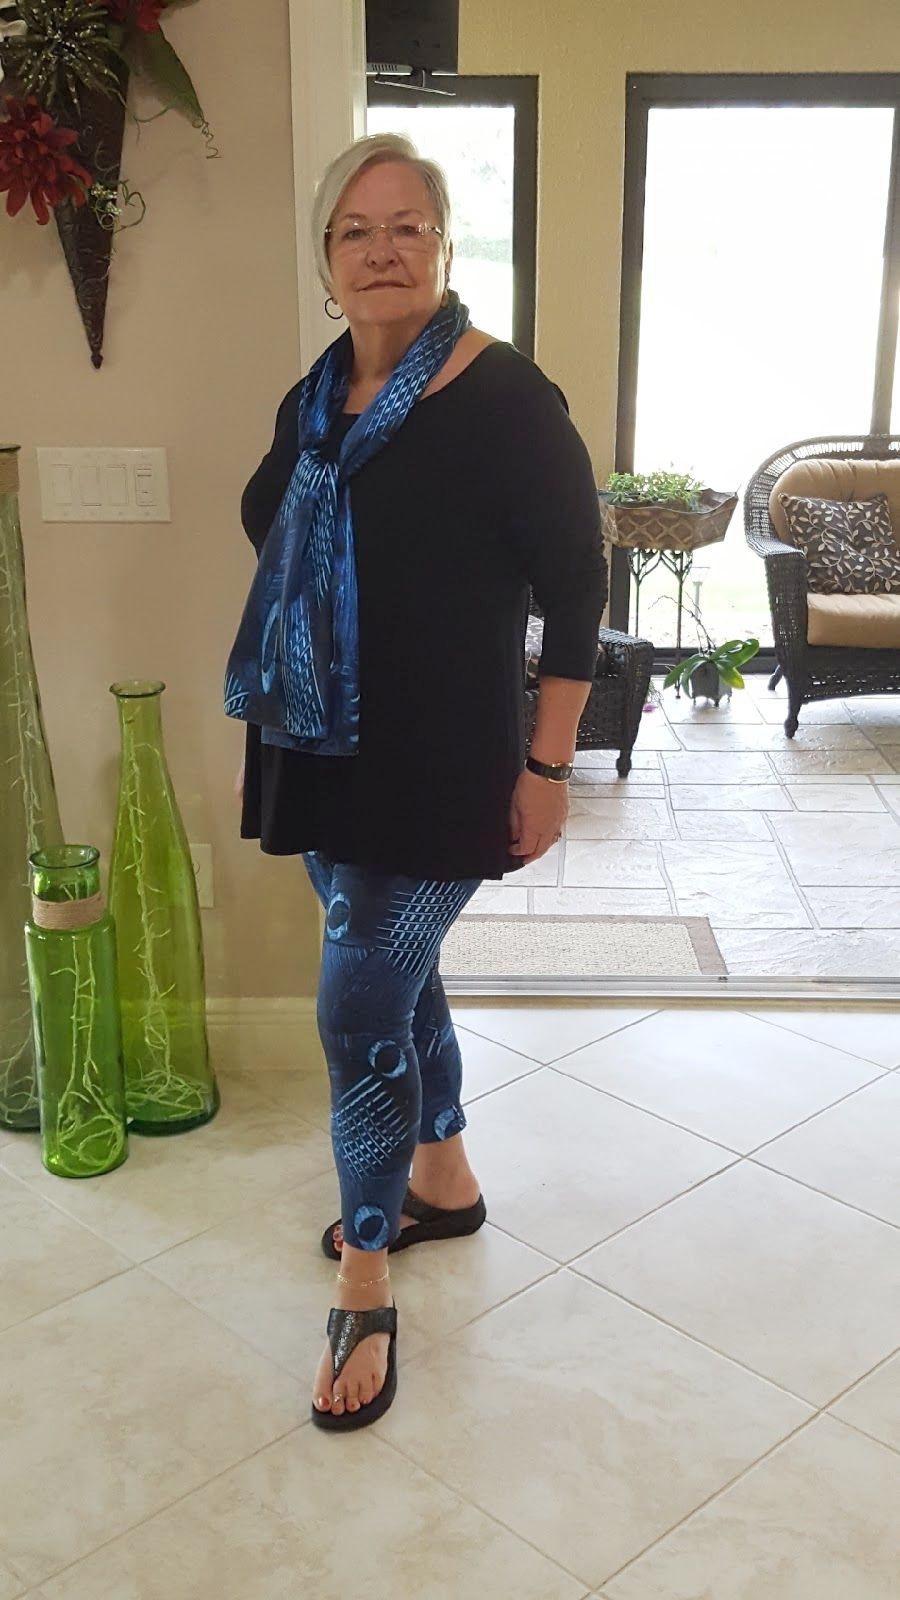 """Just wanted to let you know I'm a plus size women! PROUD OF IT! XL Mayhem yoga pants fit great!""    - Sheryl wearing the Mayhem yoga leggings and Mayhem satin chiffon scarf"